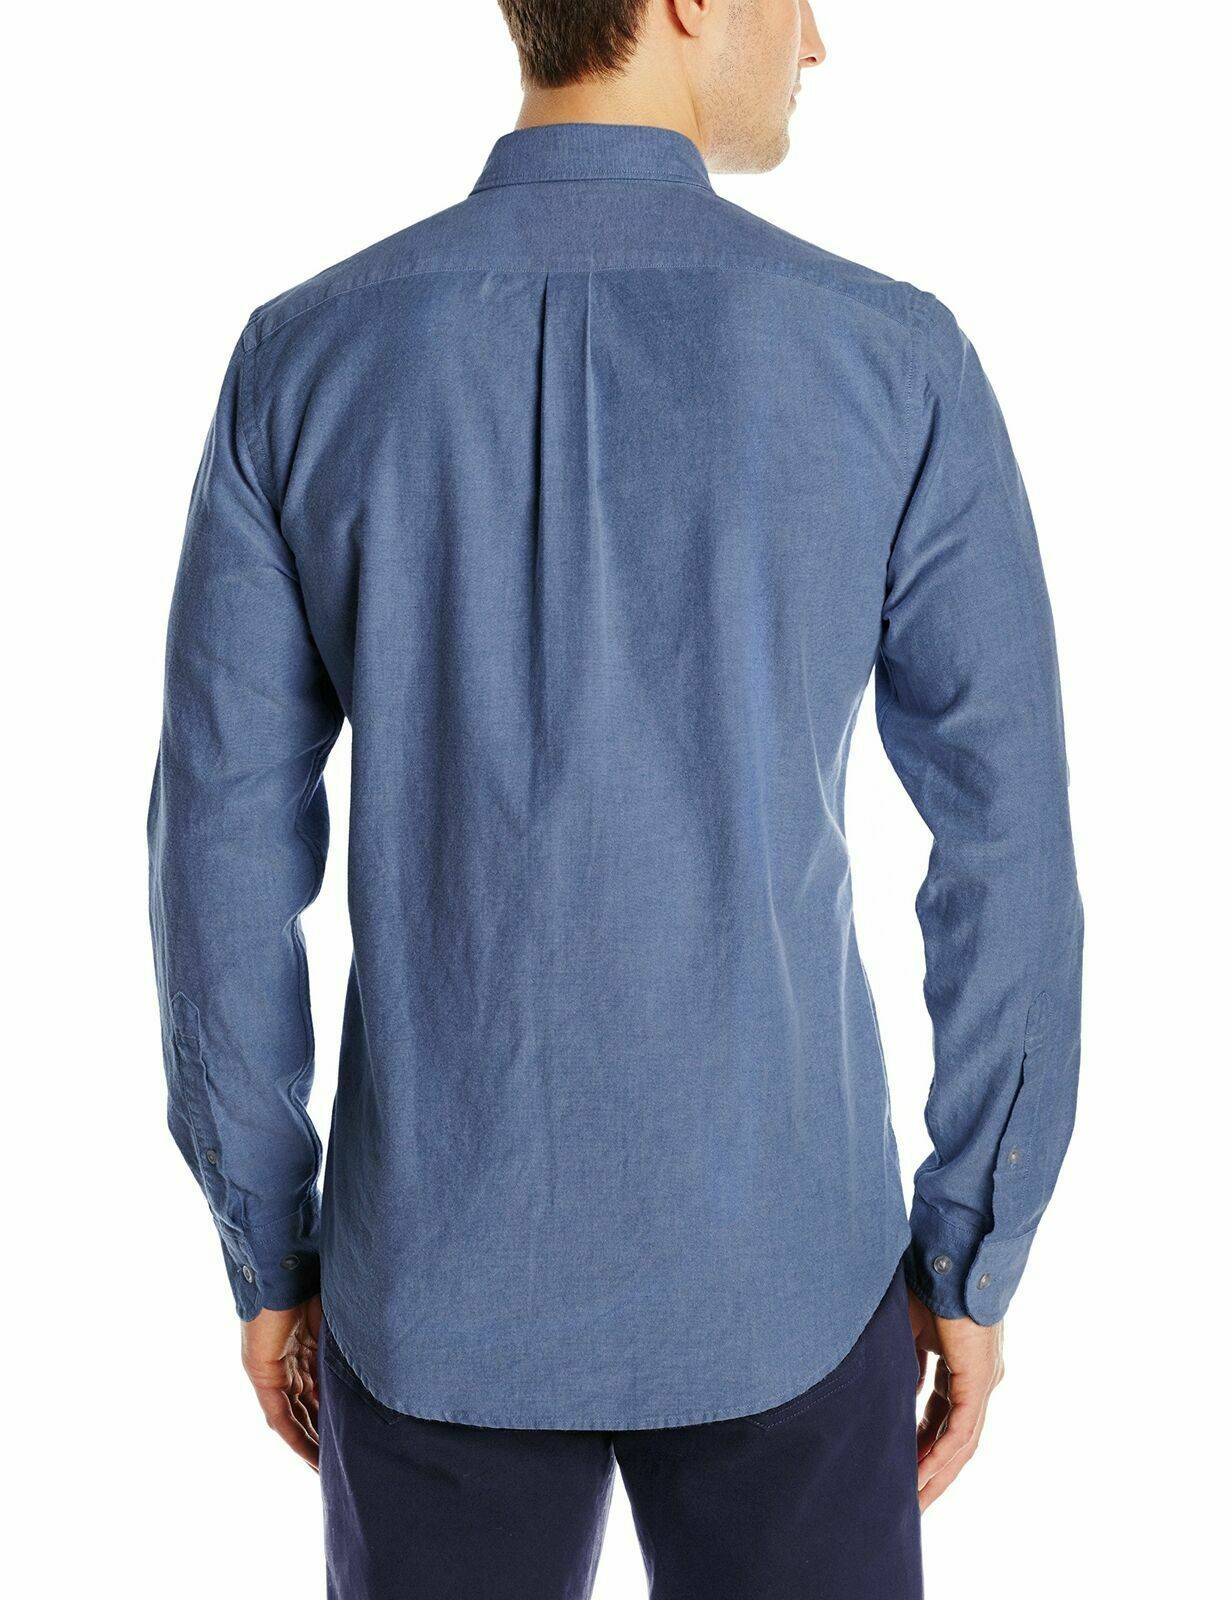 Goodthreads Men's The Perfect Oxford Shirt Slim-Fit Long-Sleeve Indigo Solid XXL